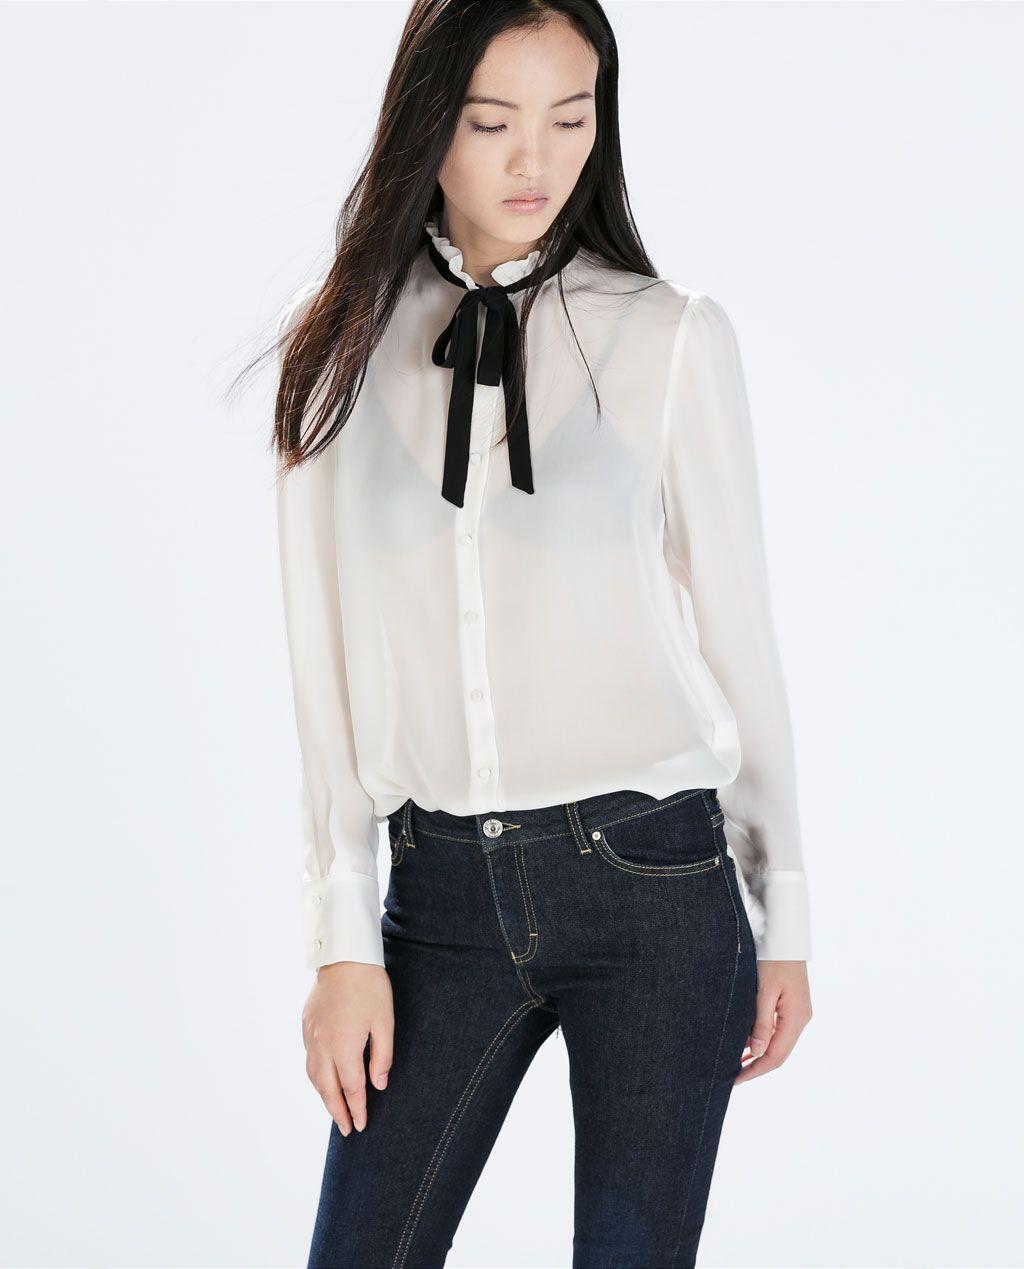 Contrast Tie-neck Silk Blouse - by Zara